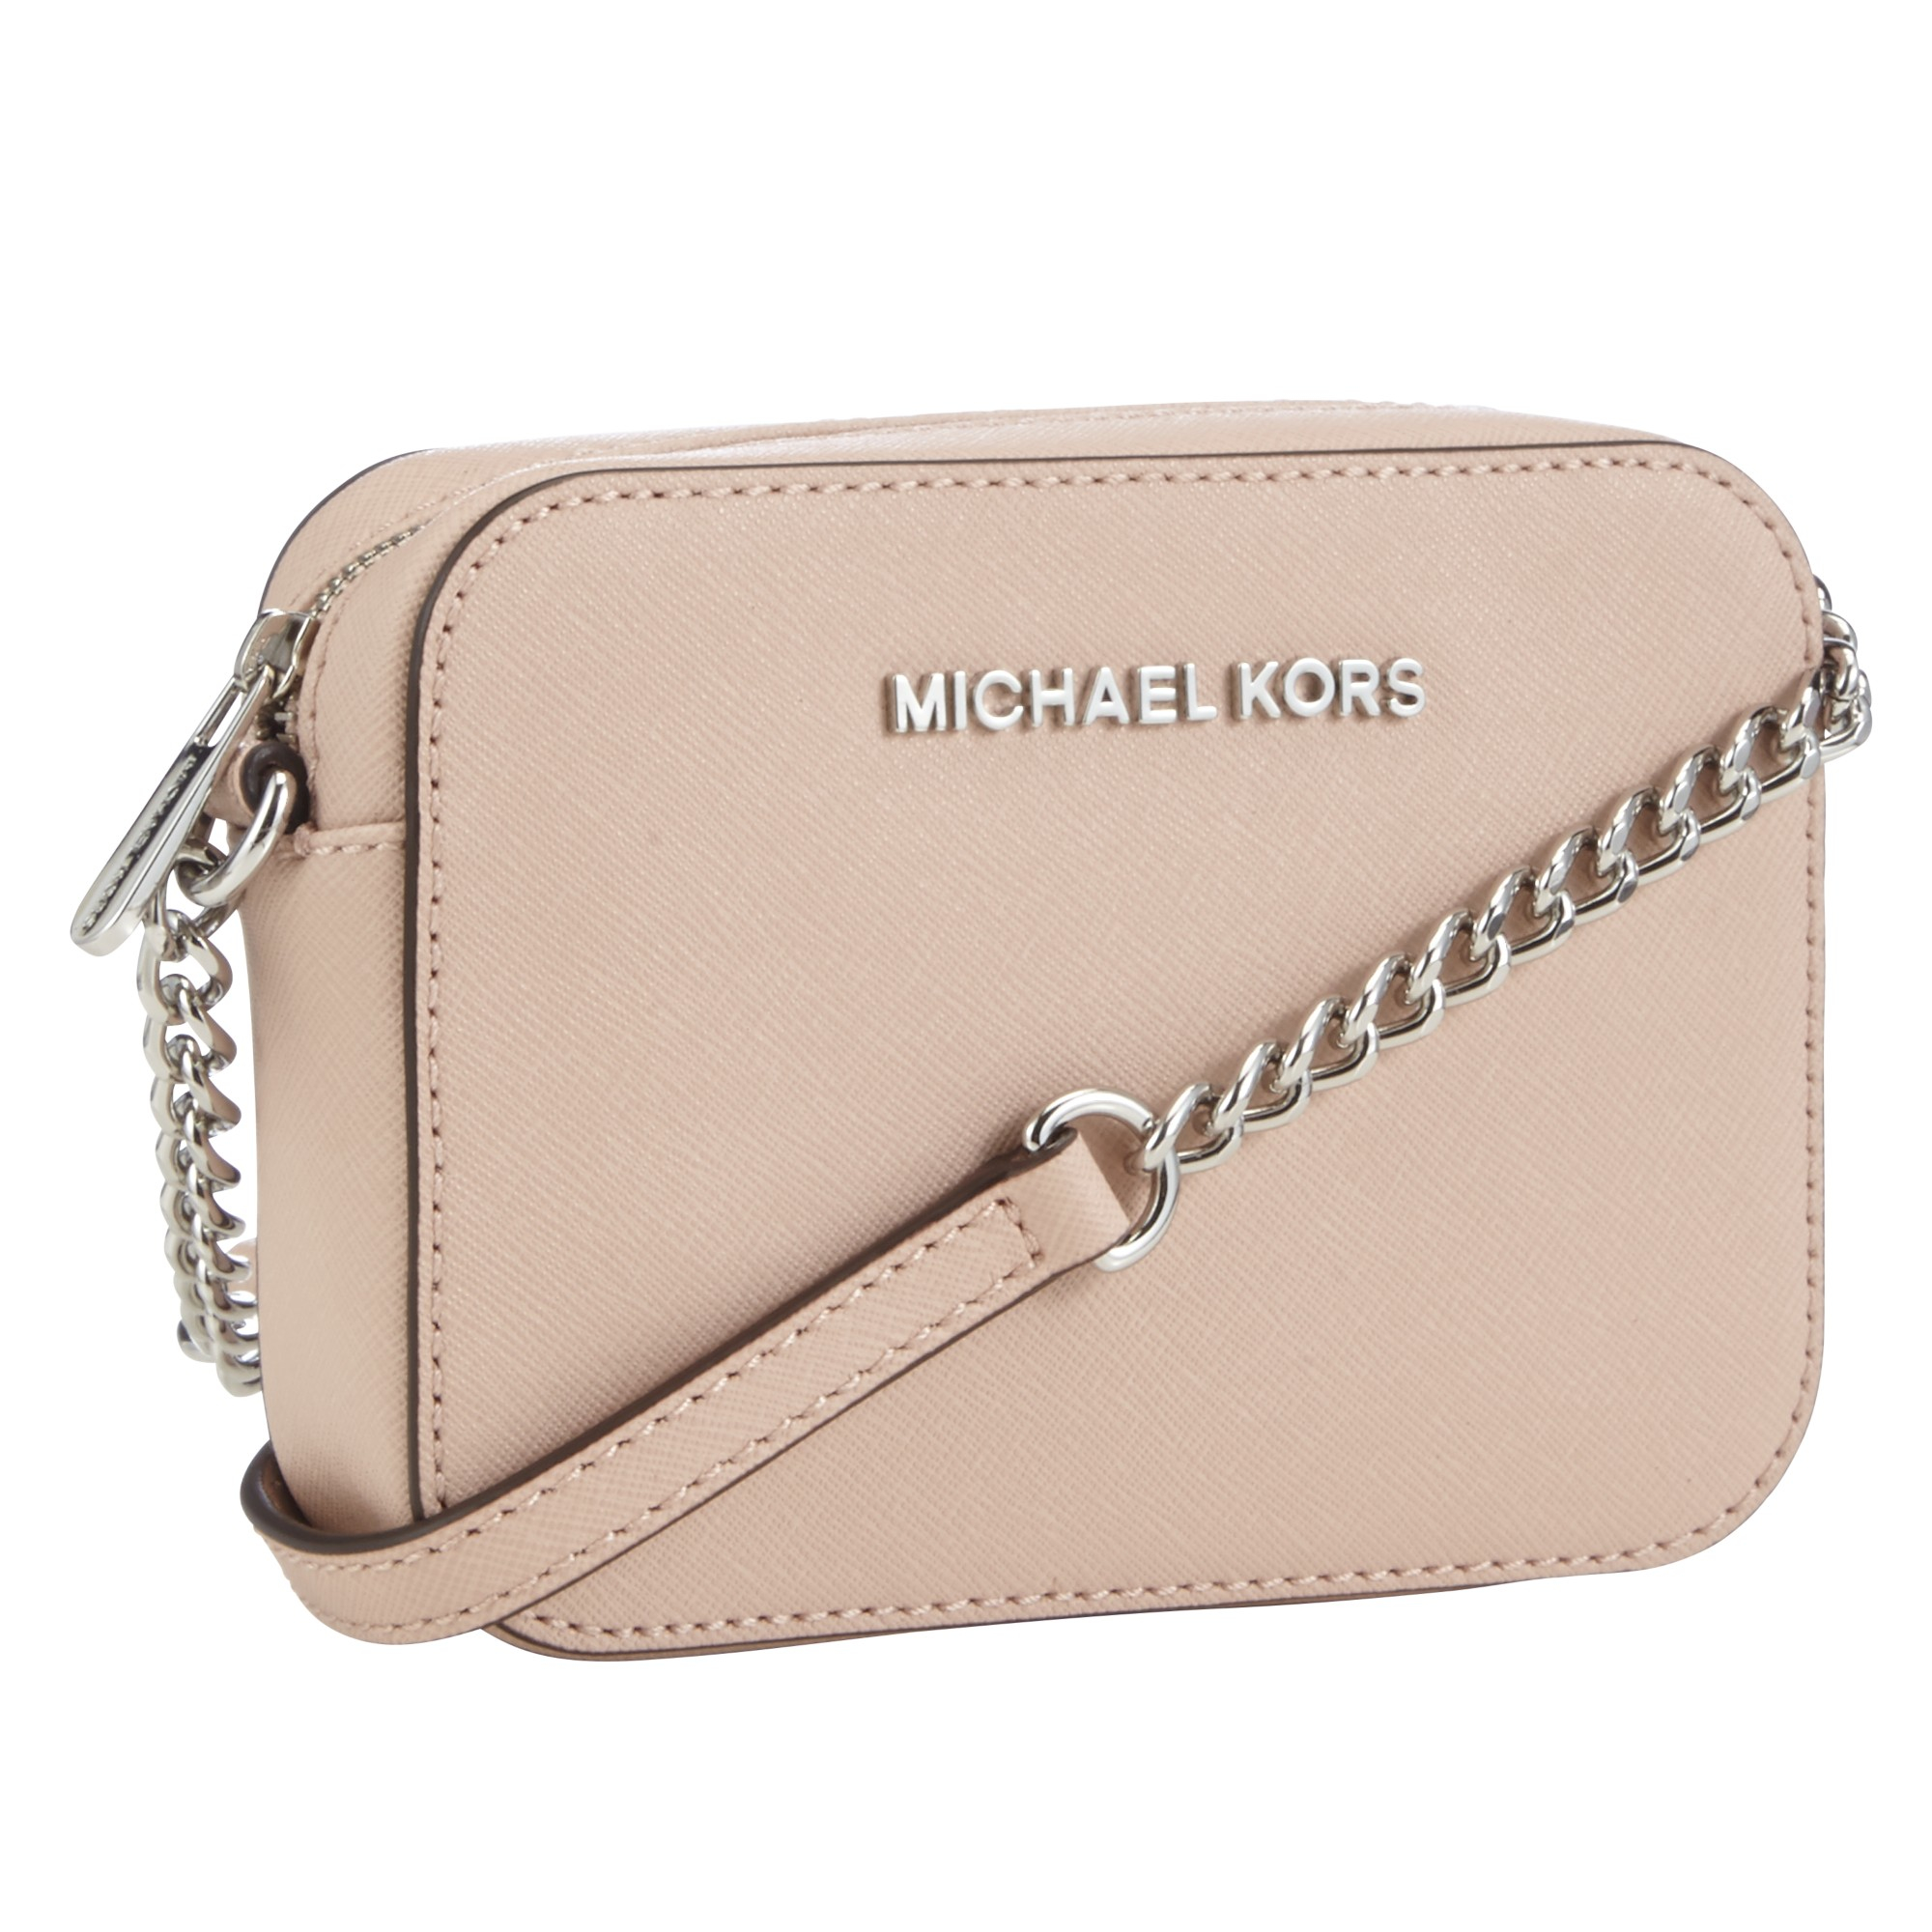 6447320972e4 MICHAEL Michael Kors Jet Set Travel Across Body Bag in Pink - Lyst